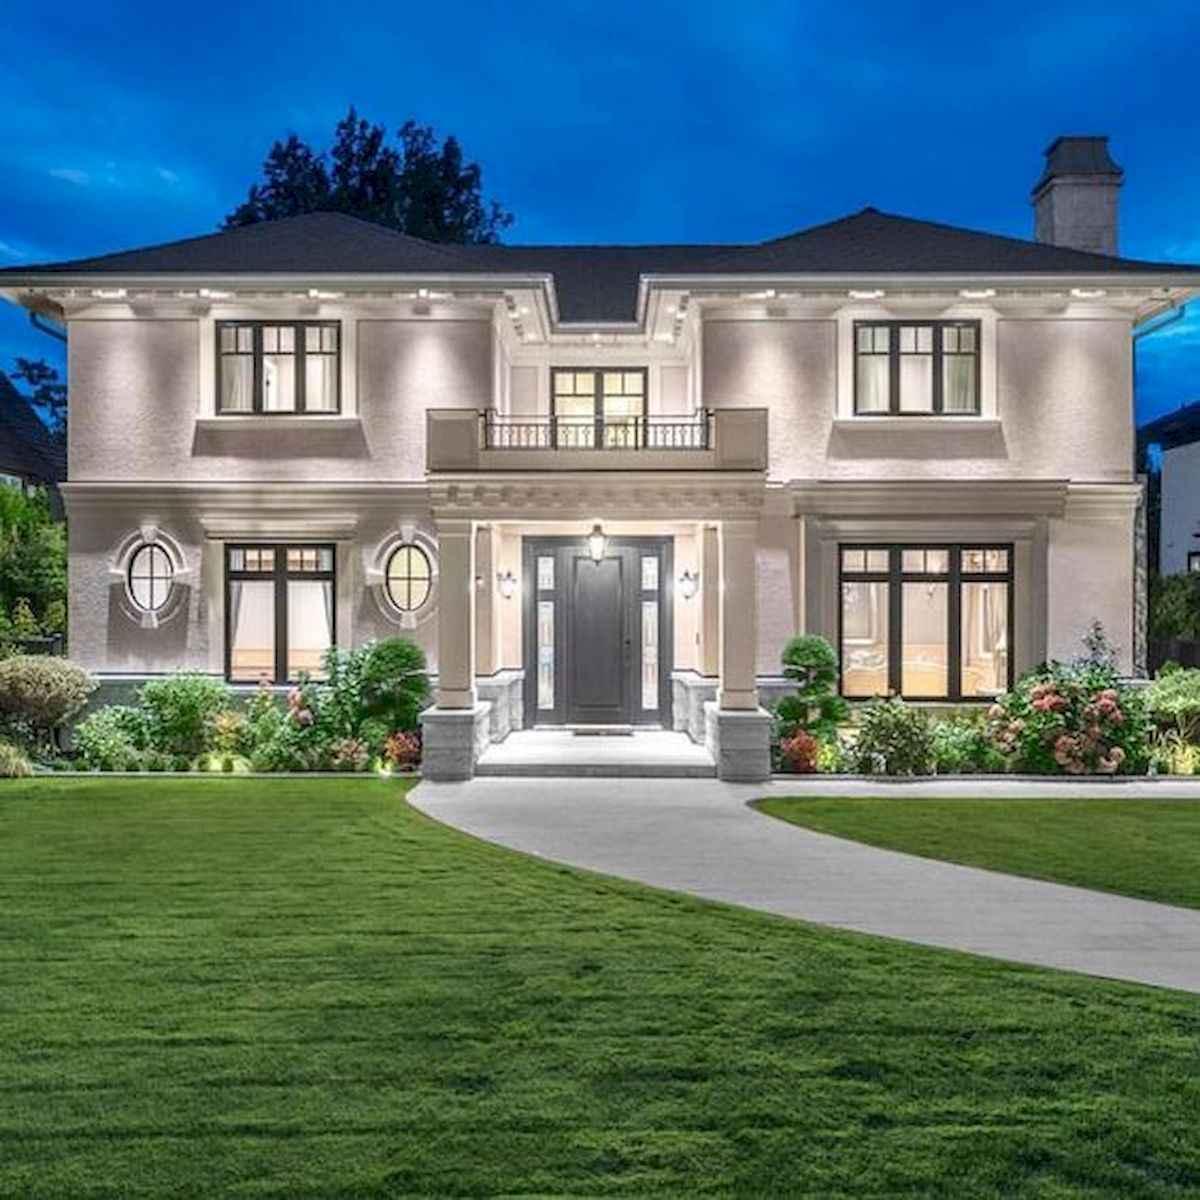 40 Stunning Mansions Luxury Exterior Design Ideas (2)